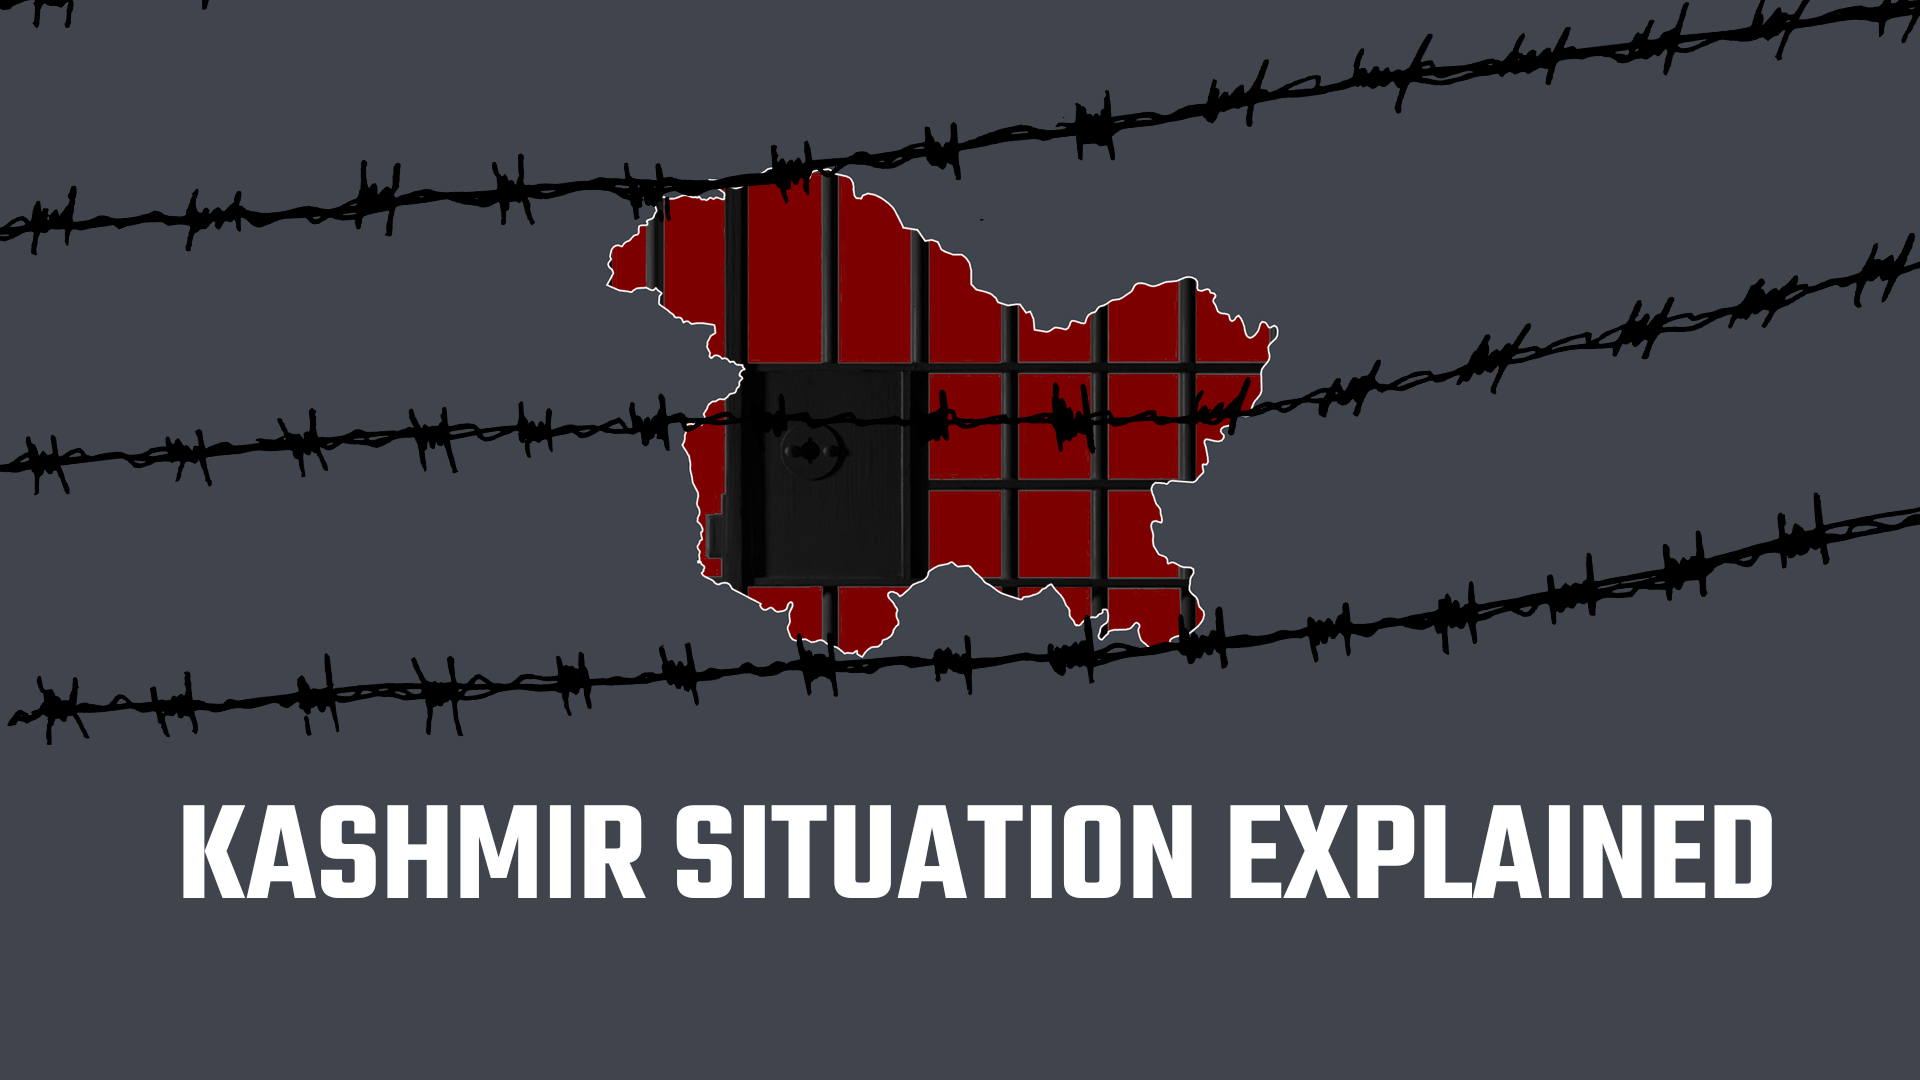 Kashmir situation explained_Article 370